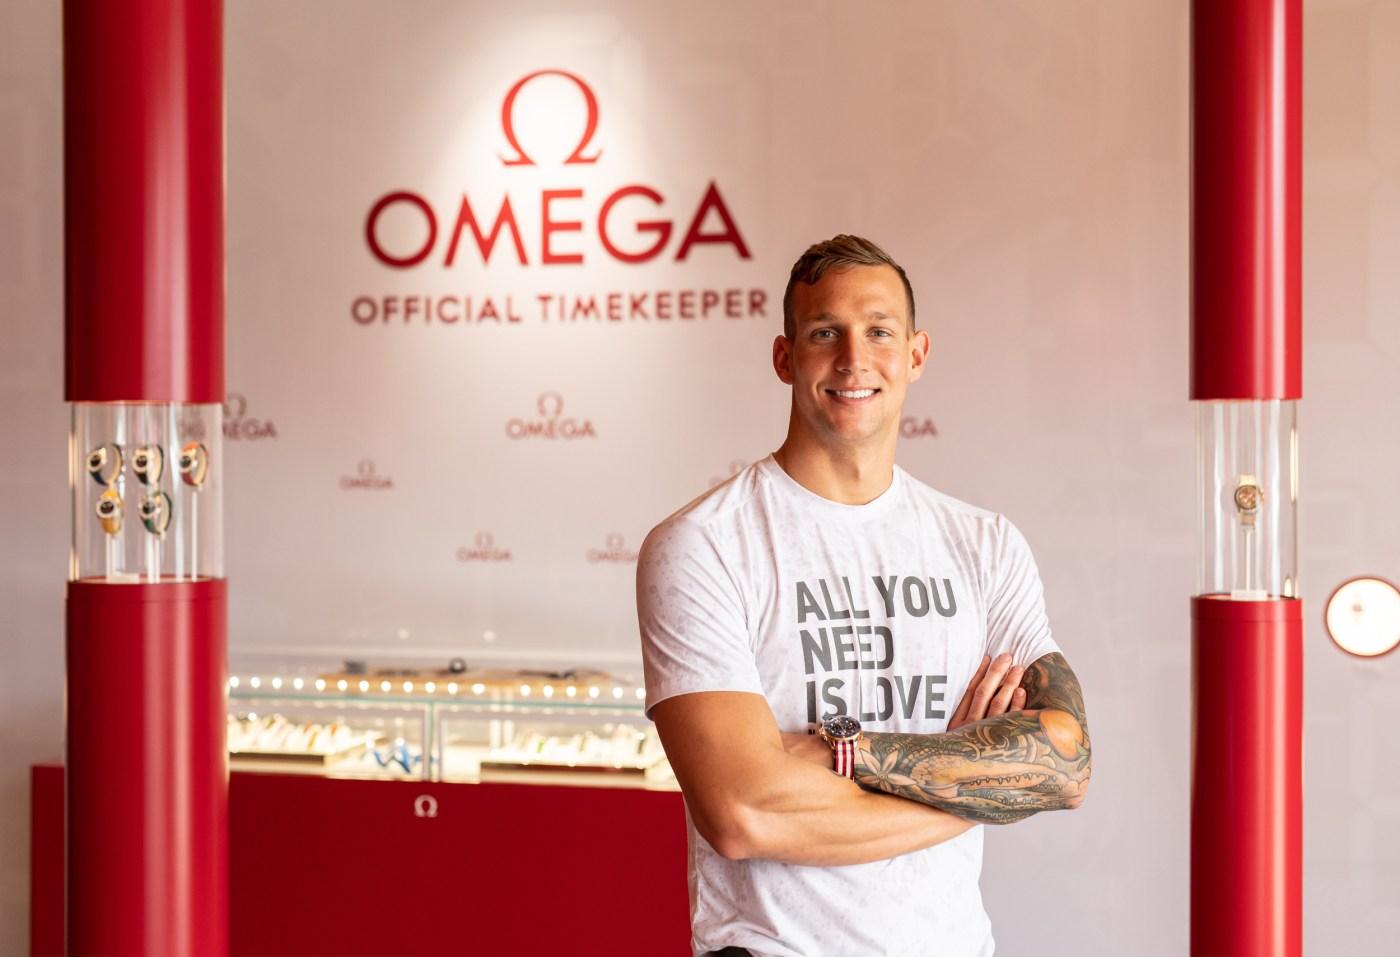 Omega ambassador Caeleb Dressel